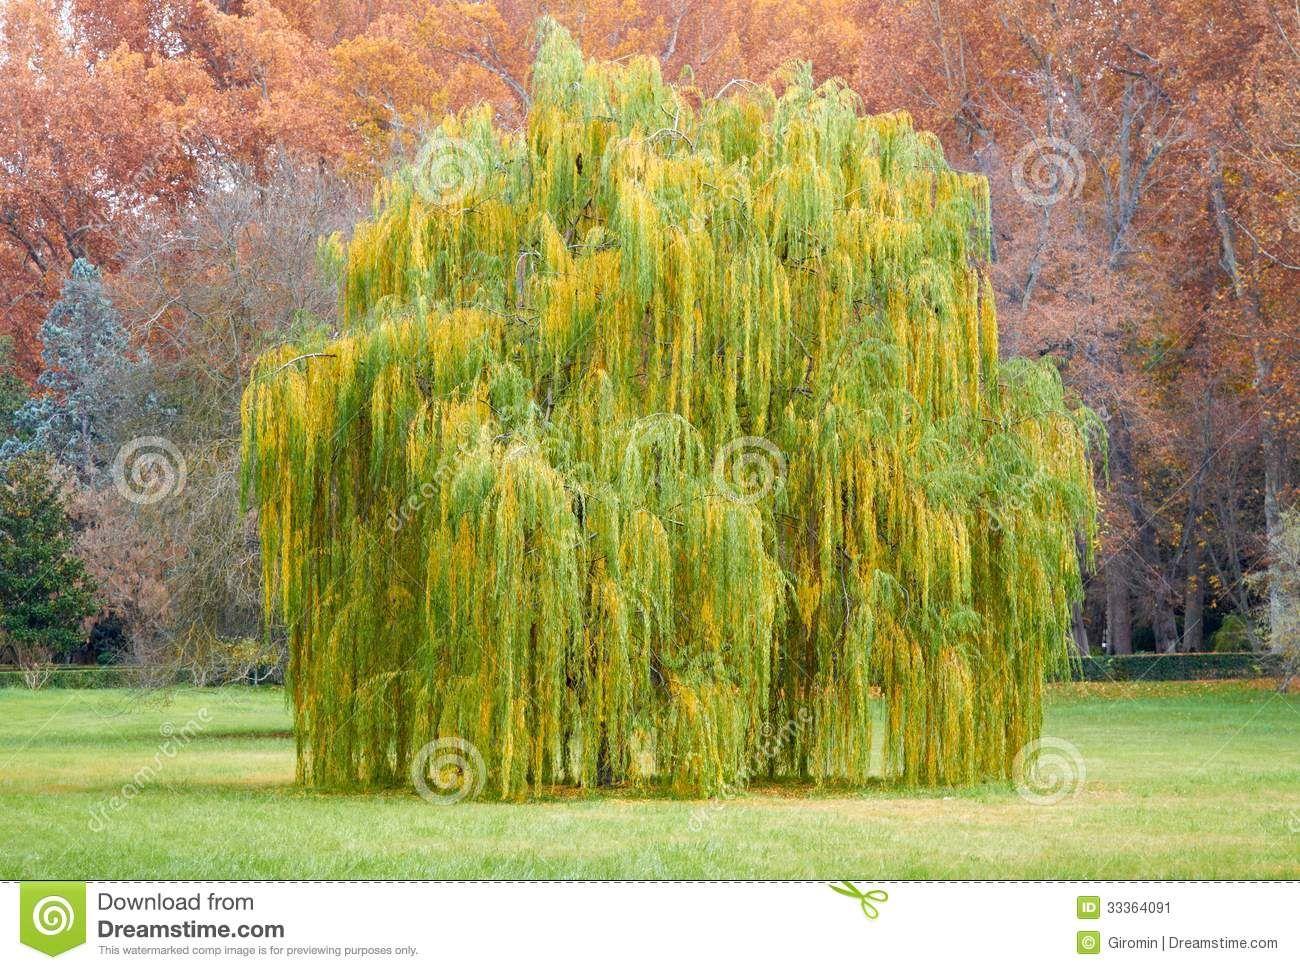 Salix babylonica - Google Search | Dendrologija | Pinterest ...